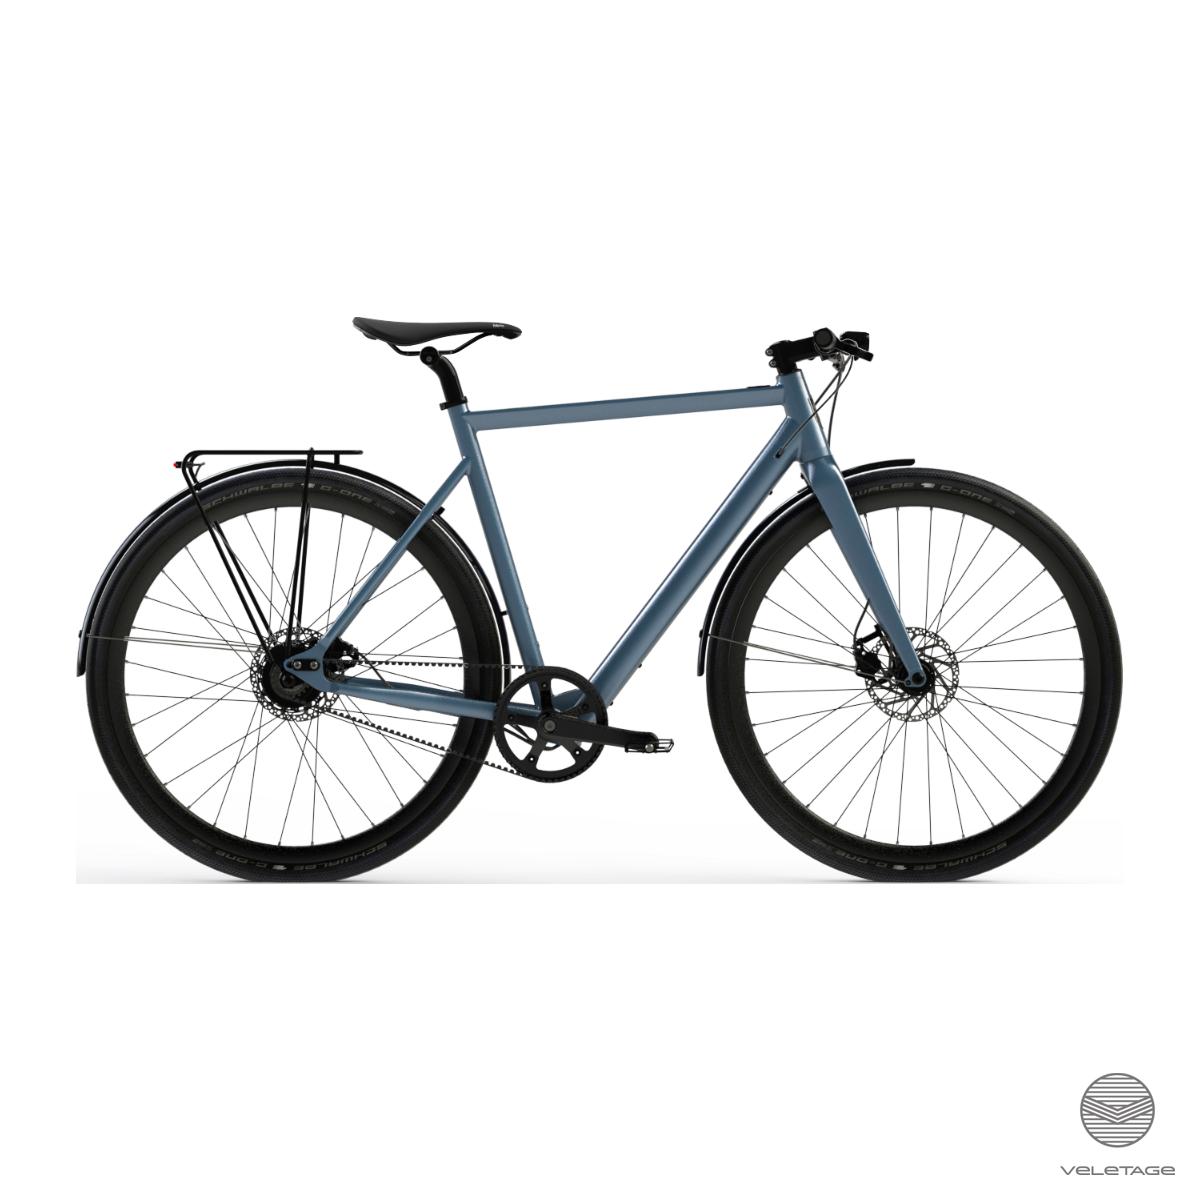 6 KU Singlespeed & Fixie Rogue rosa Bicycle Company